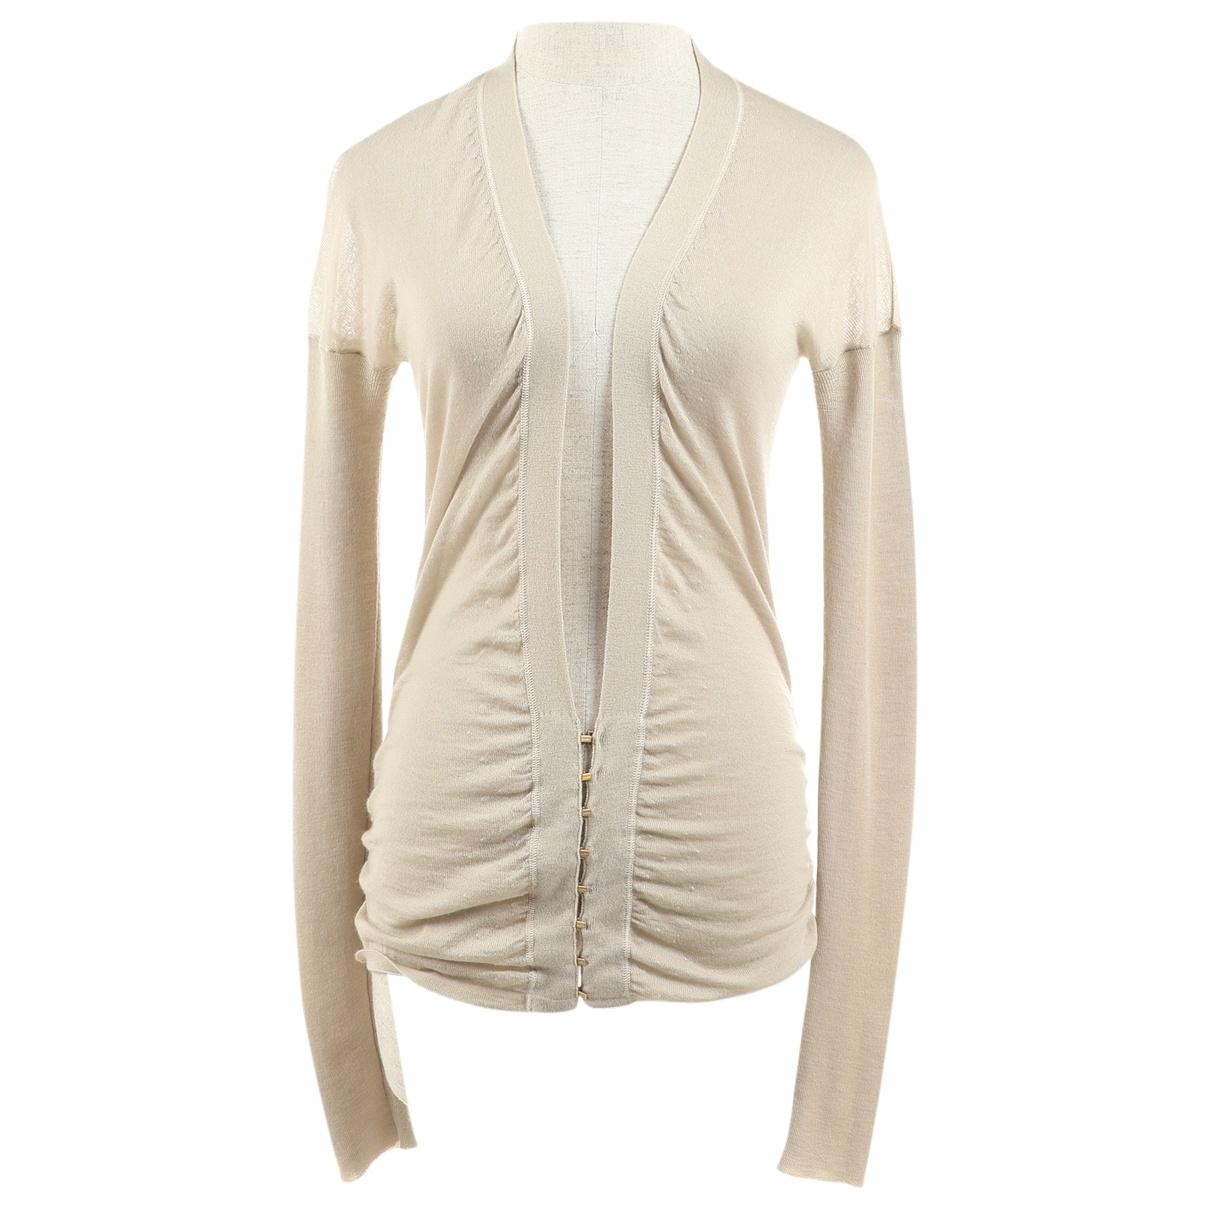 Gucci \N Cashmere Knitwear for Women S International